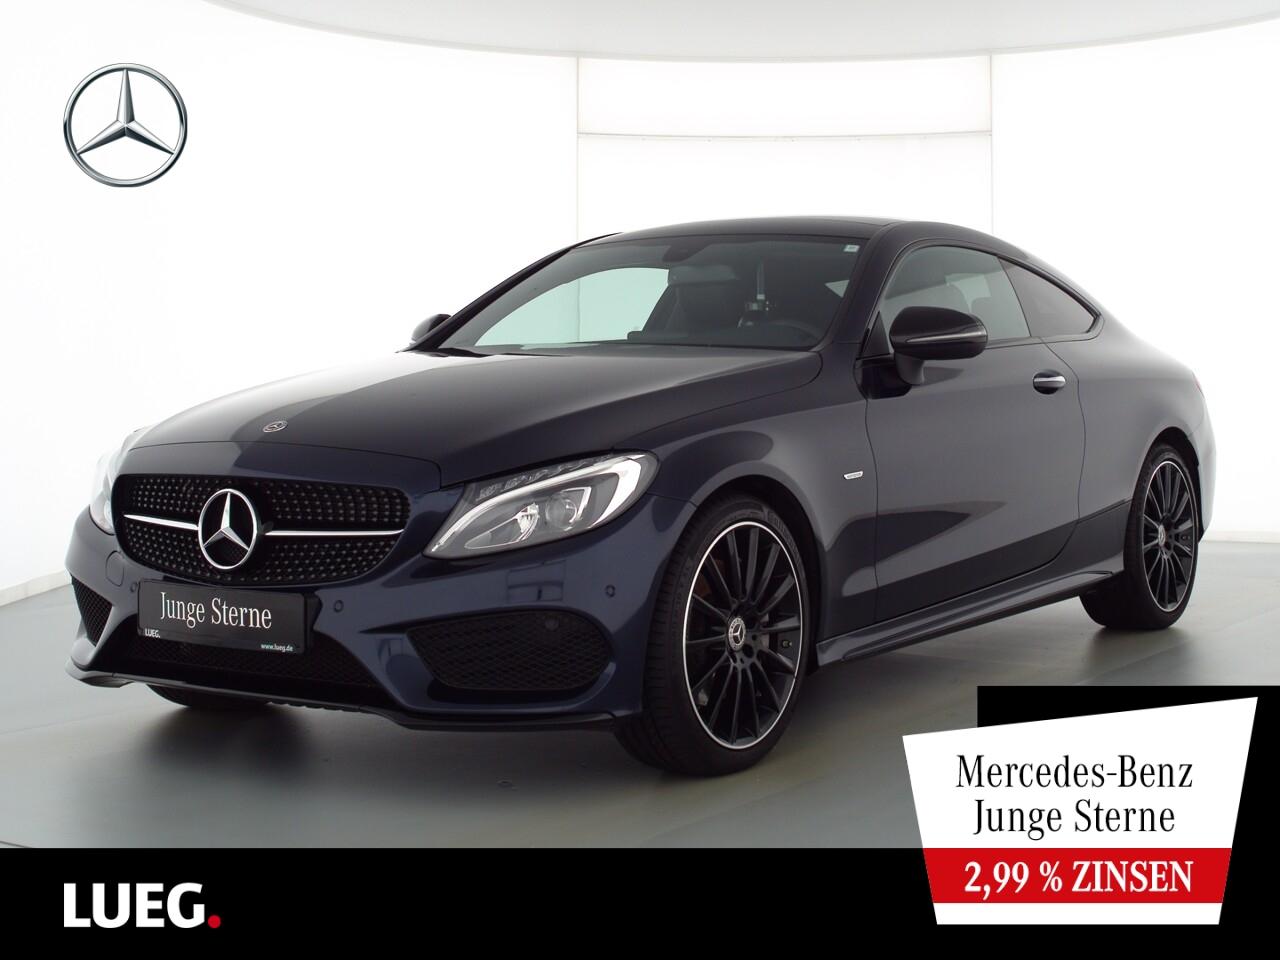 Mercedes-Benz C 250 Coupe AMG+Navi+Pano+LED-HP+Sthzg+KeyGo+PTS, Jahr 2018, Benzin